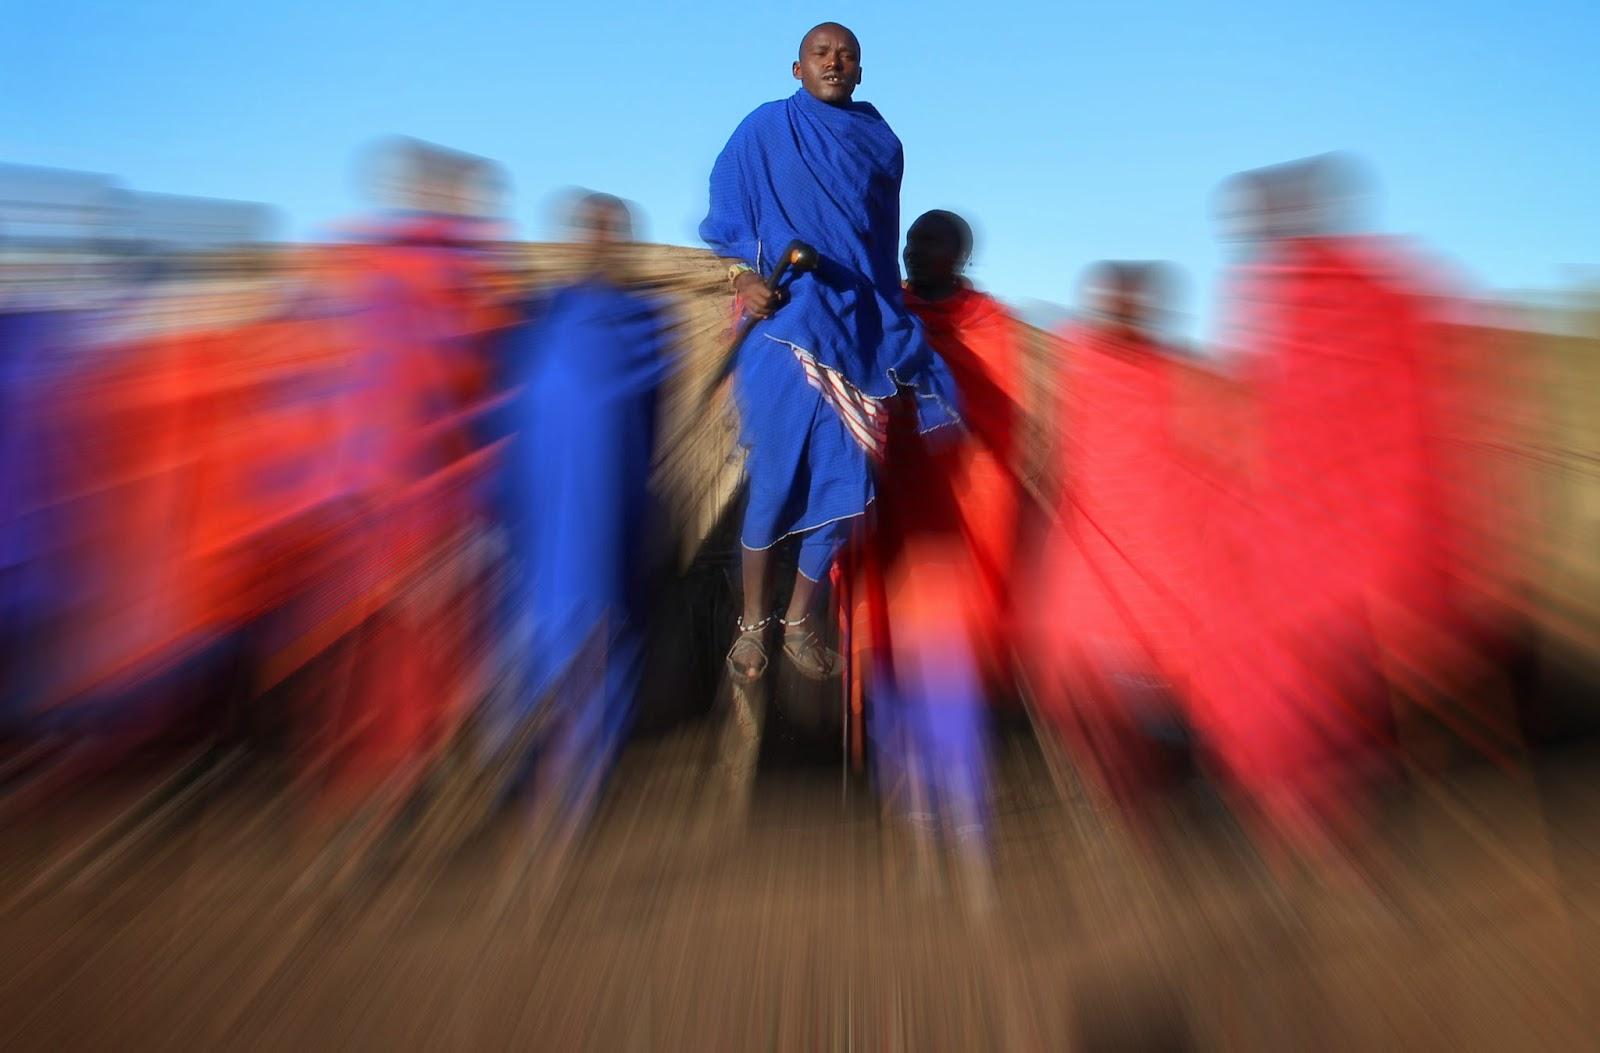 OS MAASAI - O que precisamos de saber sobre o povo Maasai | Tanzânia